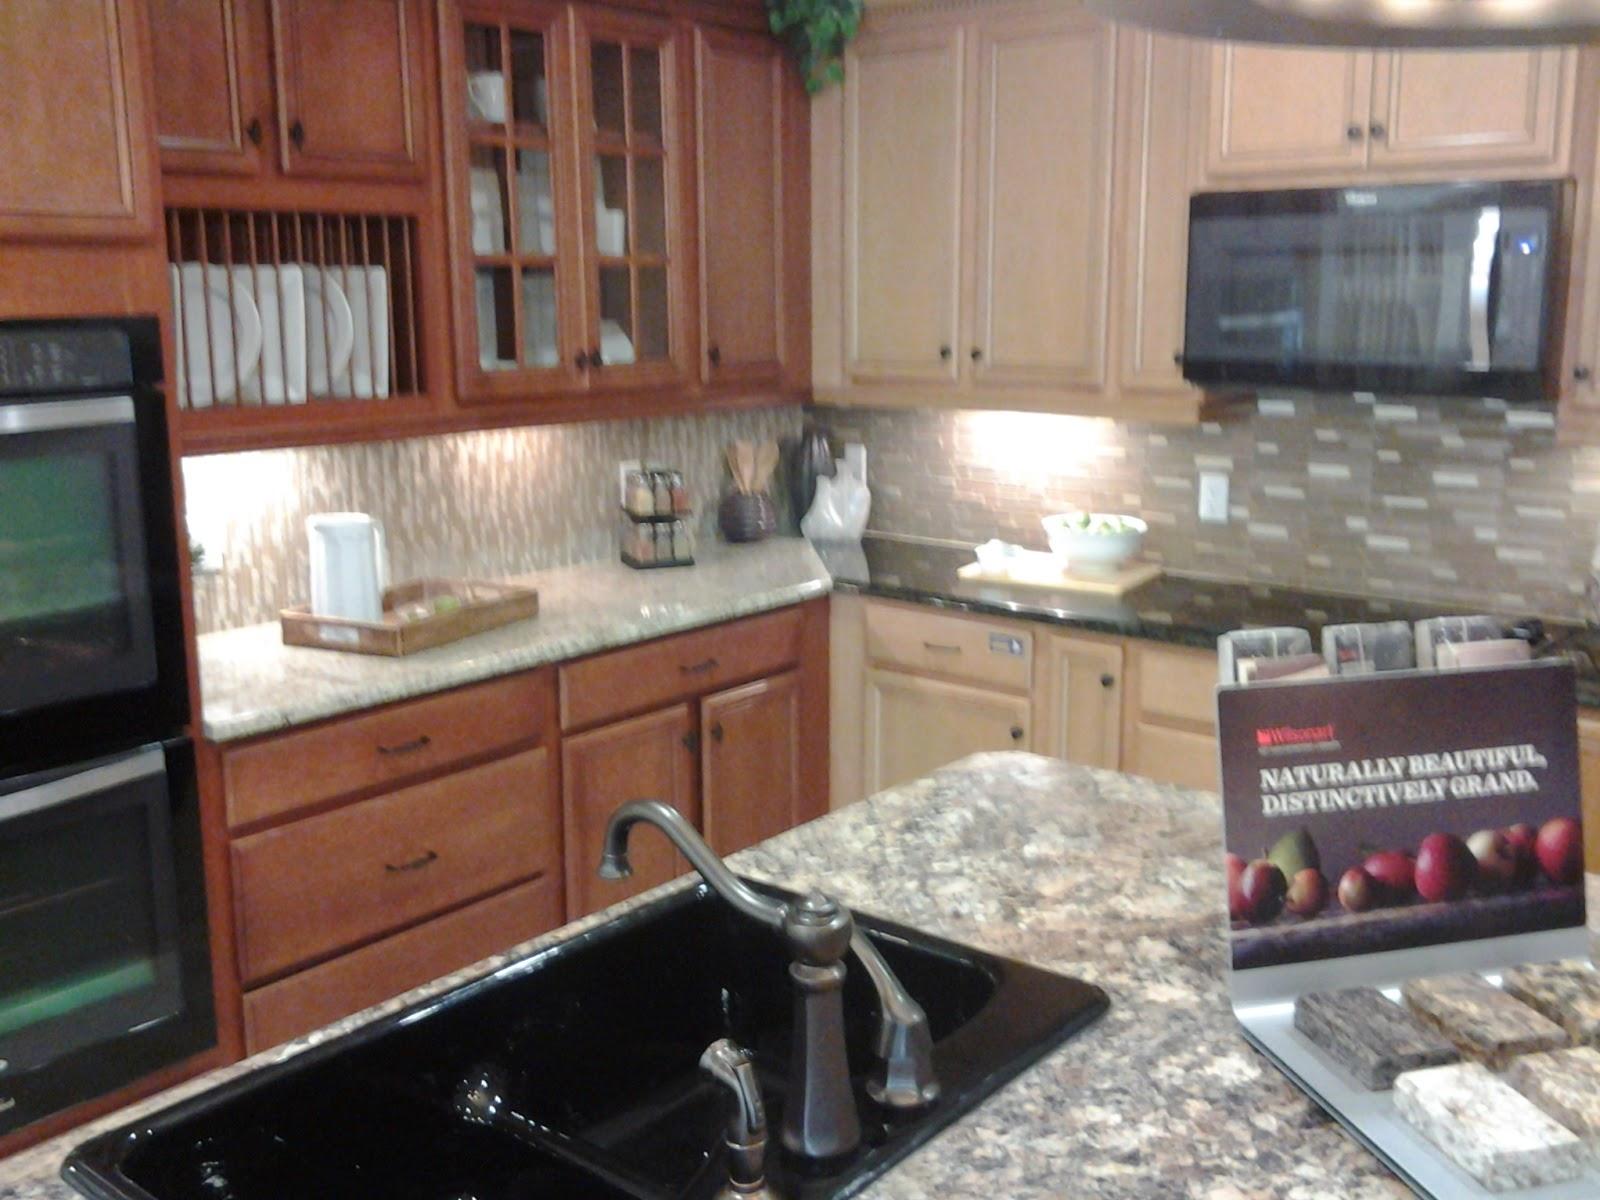 David barr 39 s sarasota and venice real estate blog venice for Kitchen cabinets venice fl